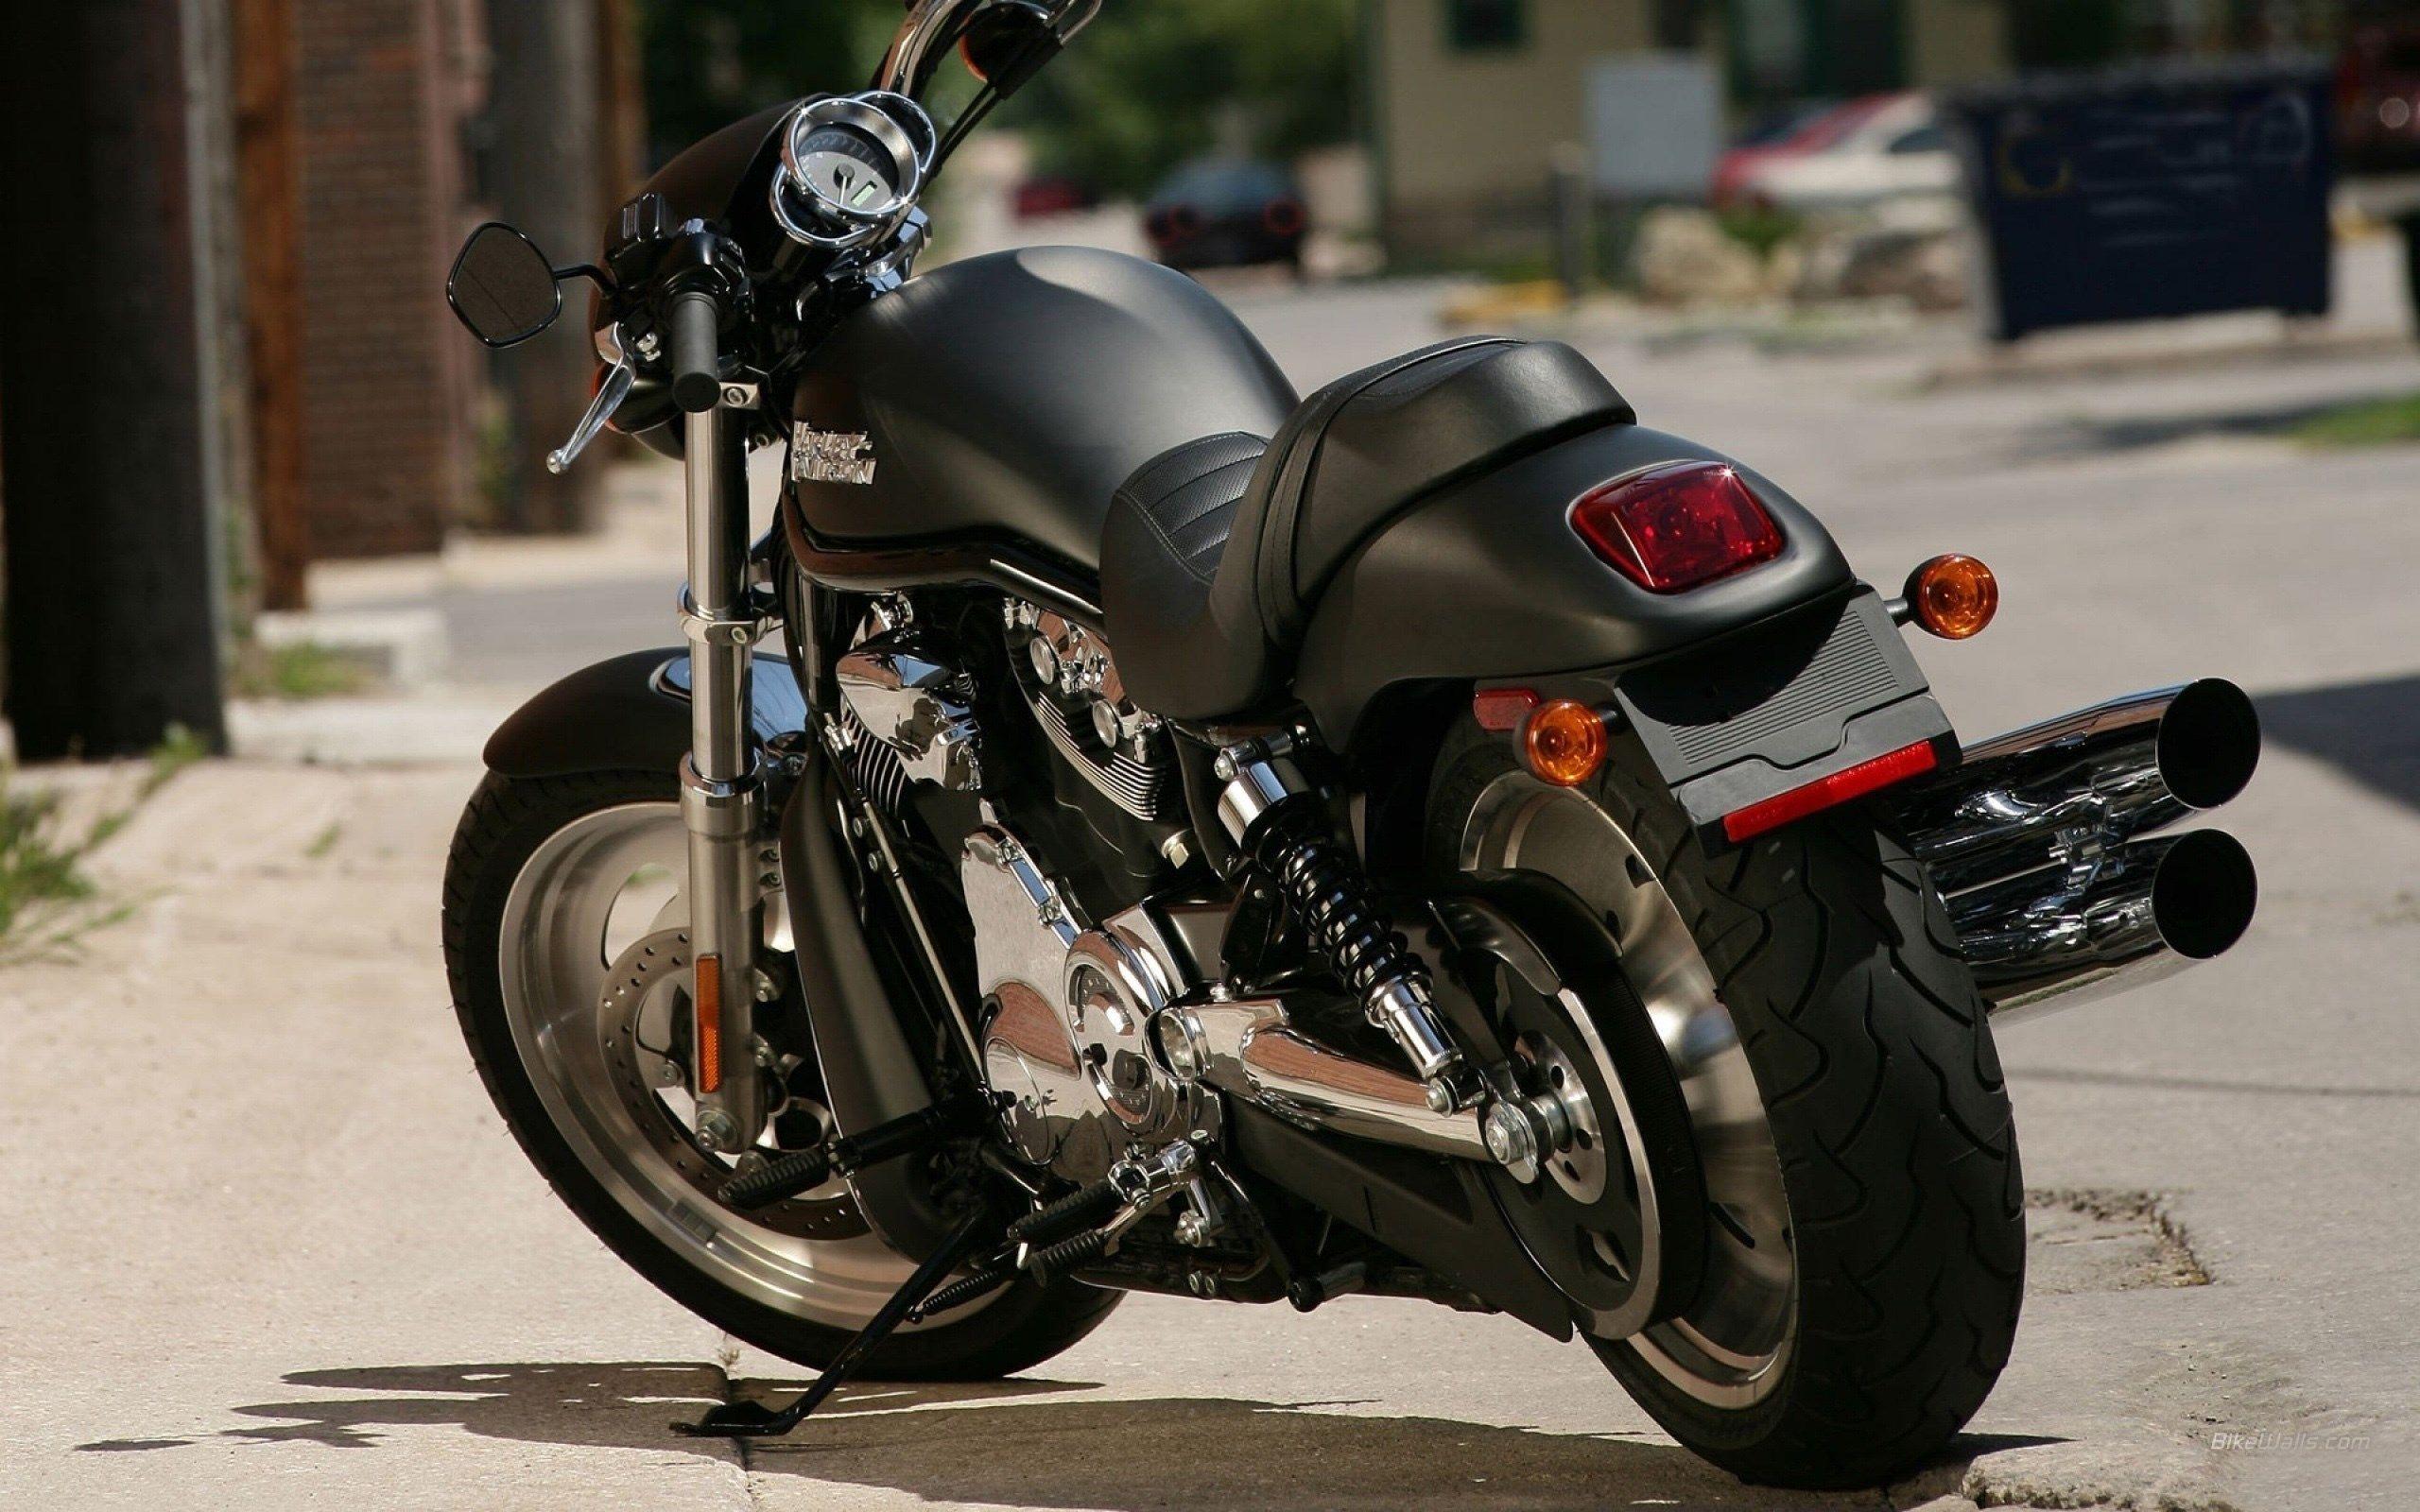 Harley Davidson Quotes Harley Davidson Back View Bike Wallpaper Hd  Ololoshka